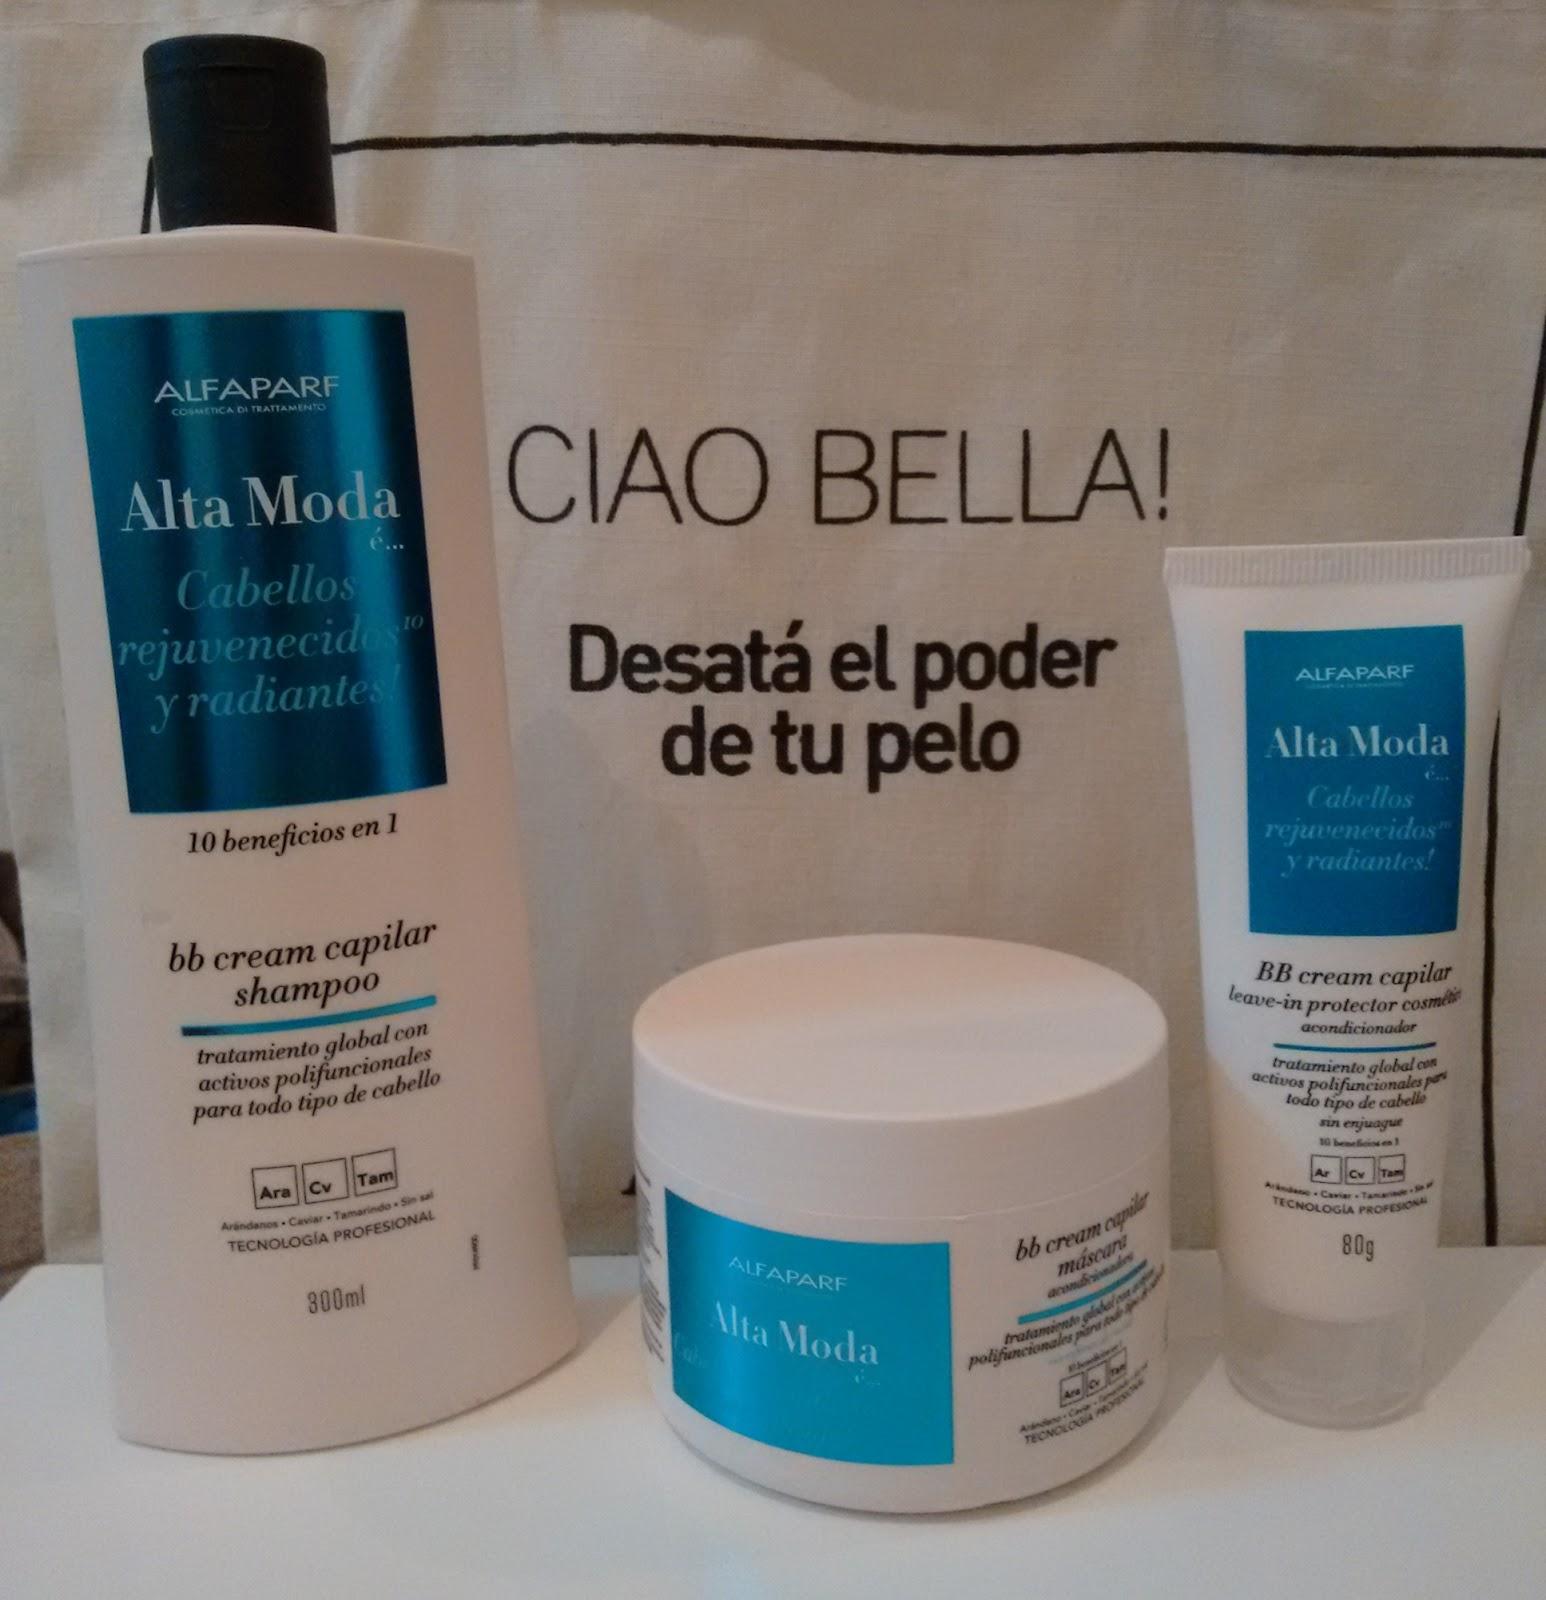 Productos de Alta Moda é fedf90cd92b9